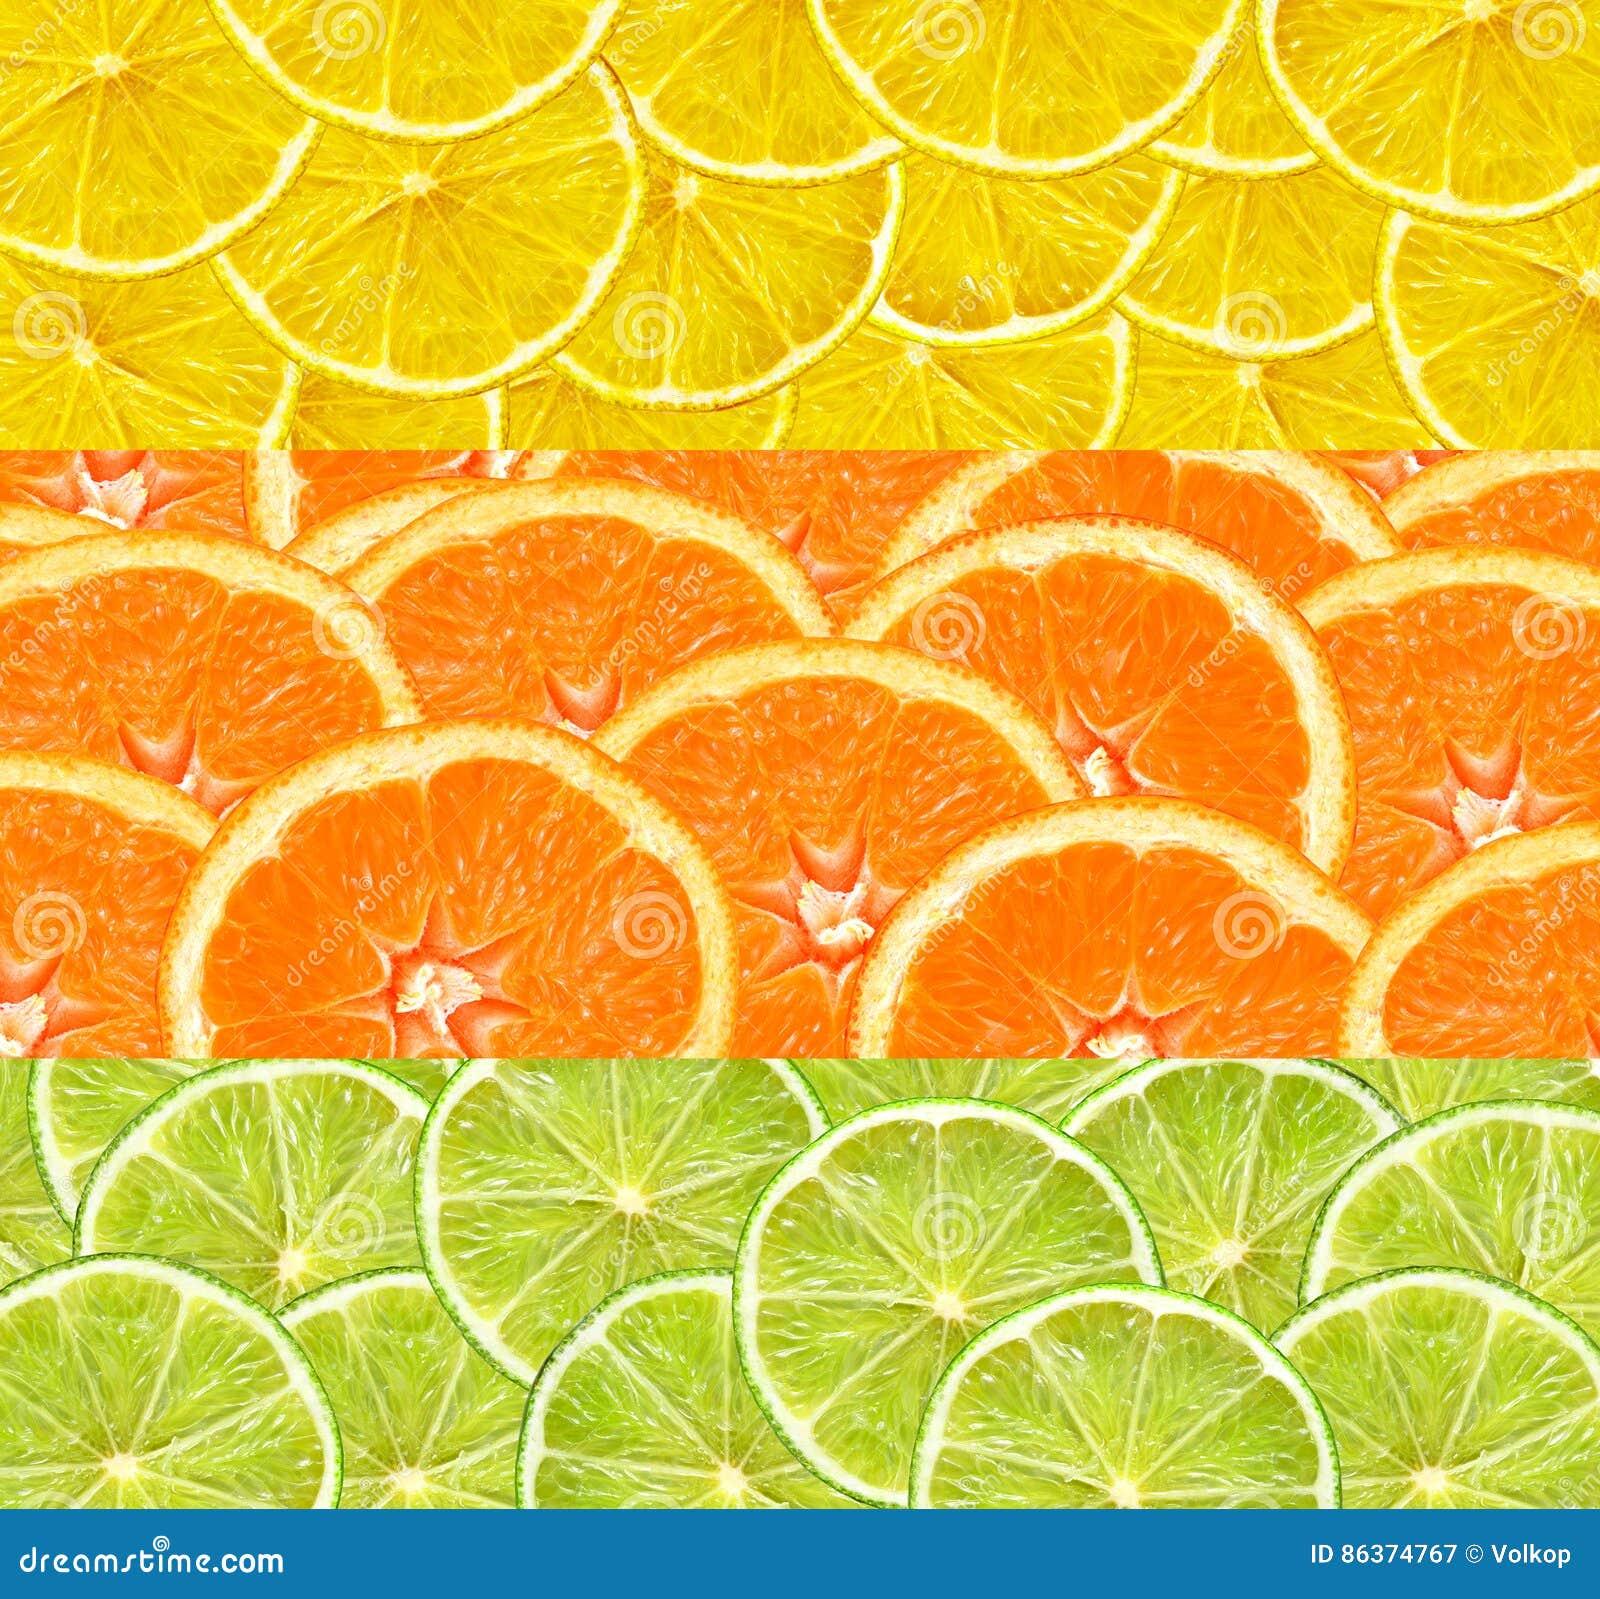 Collage med citrusfrukt av limefrukt-, citron- och apelsinskivor